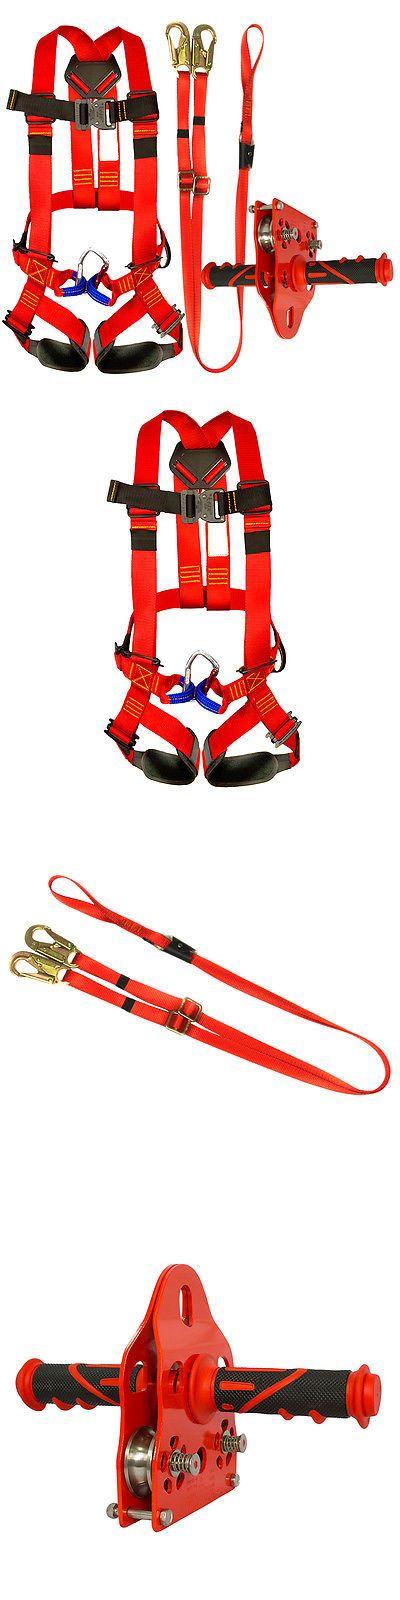 how to build a zipline in backyard